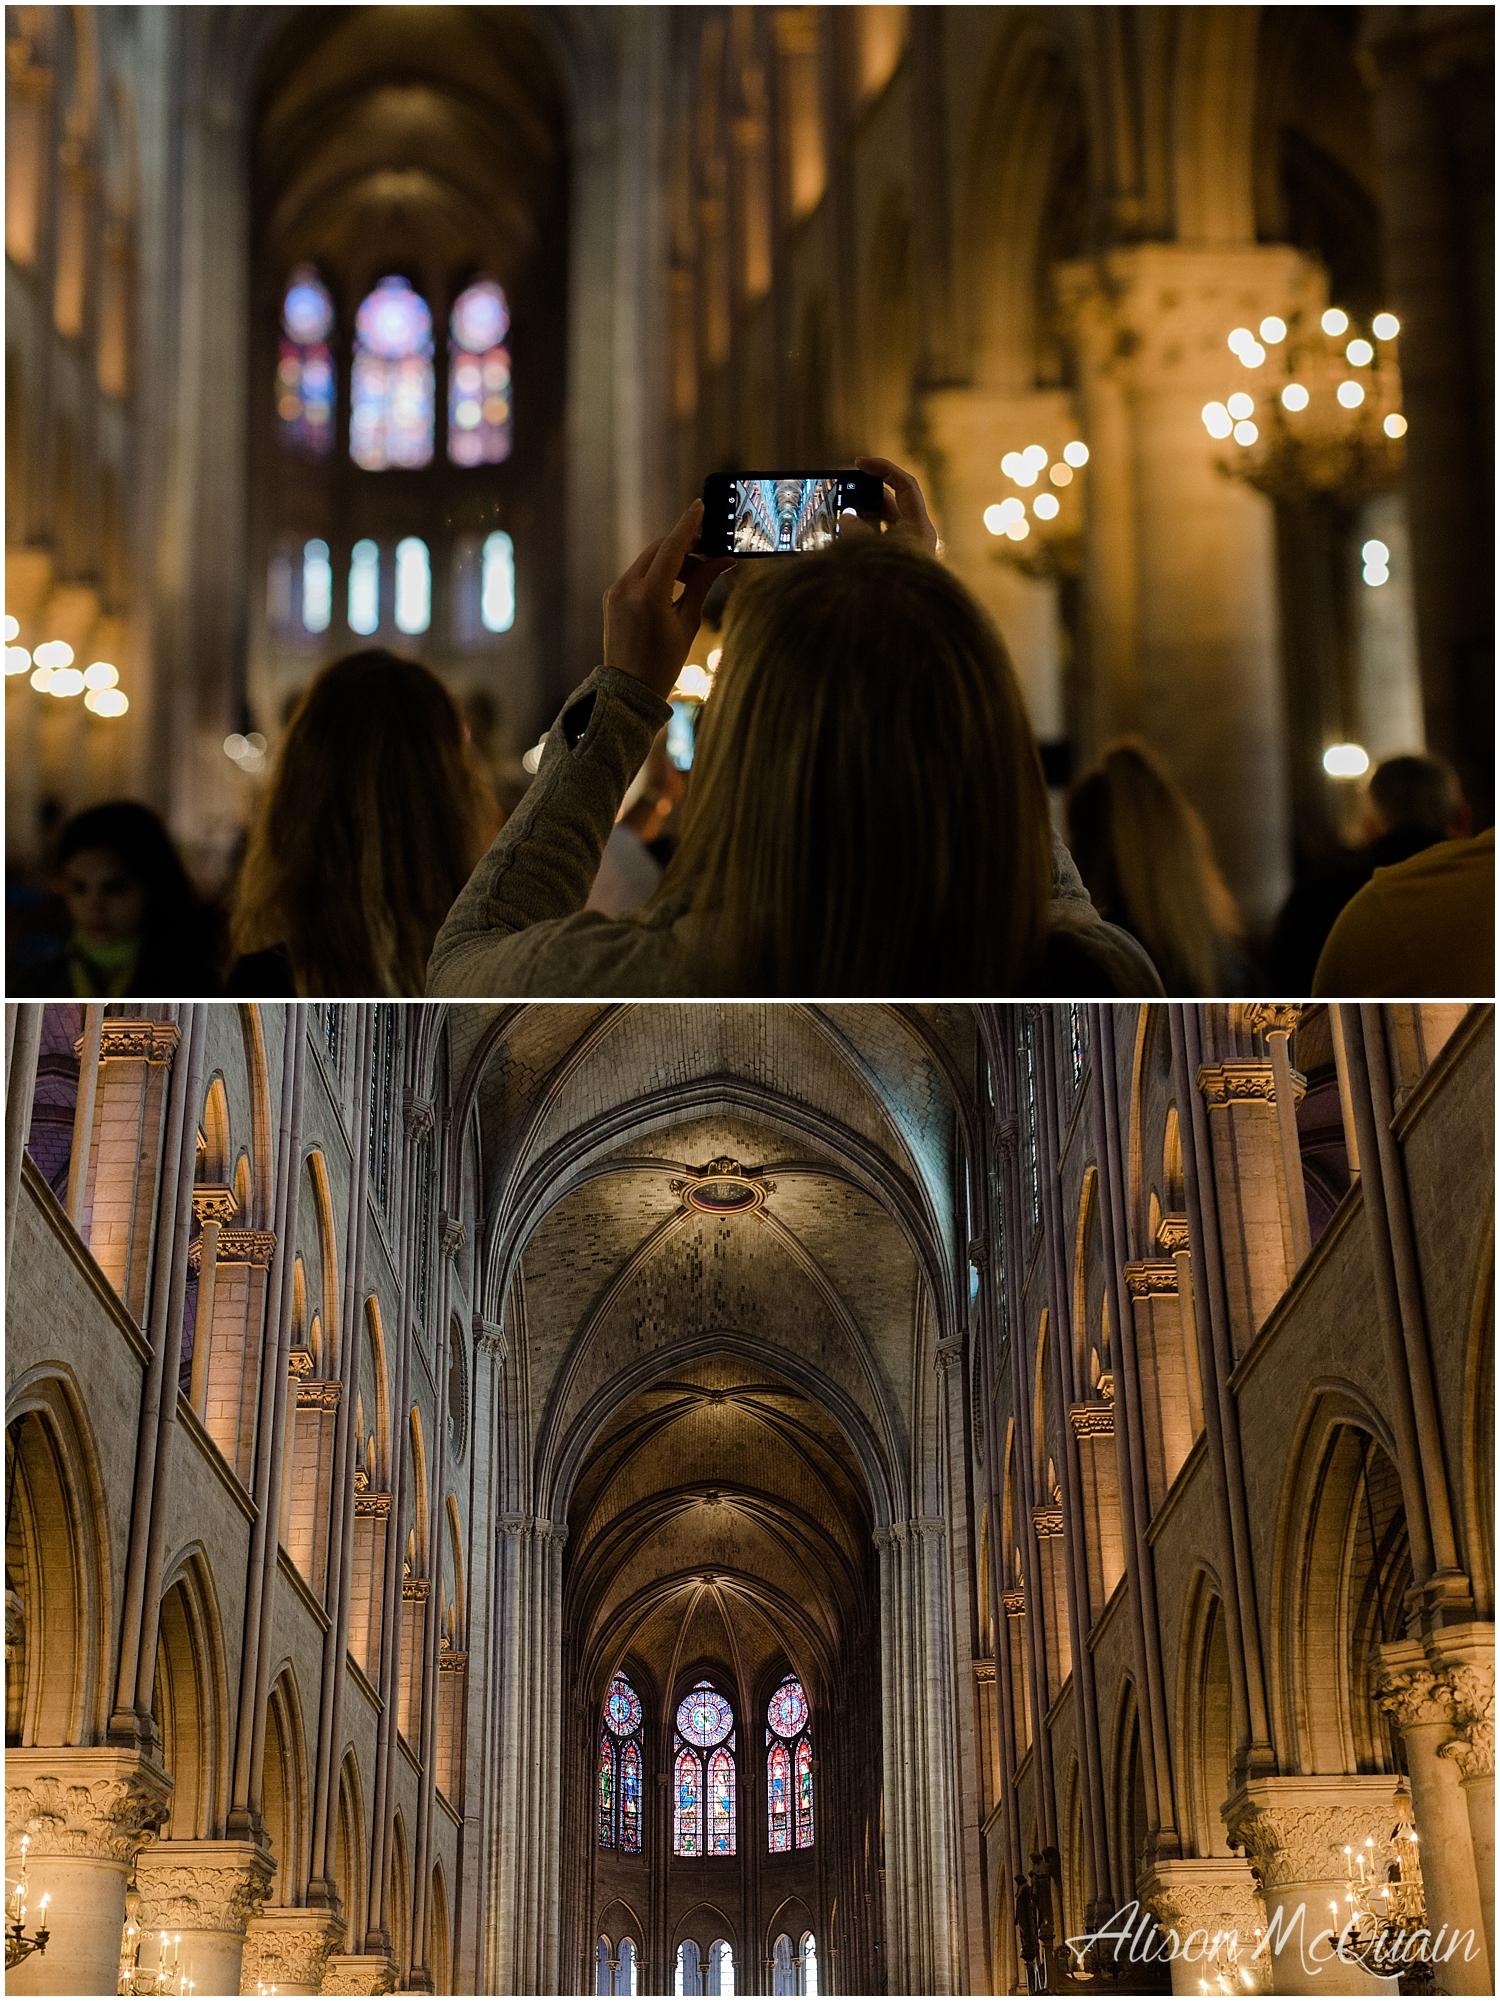 France_Paris_Marseille_Cassis_alisonmcquainphtography2018-04-27_0028.jpg